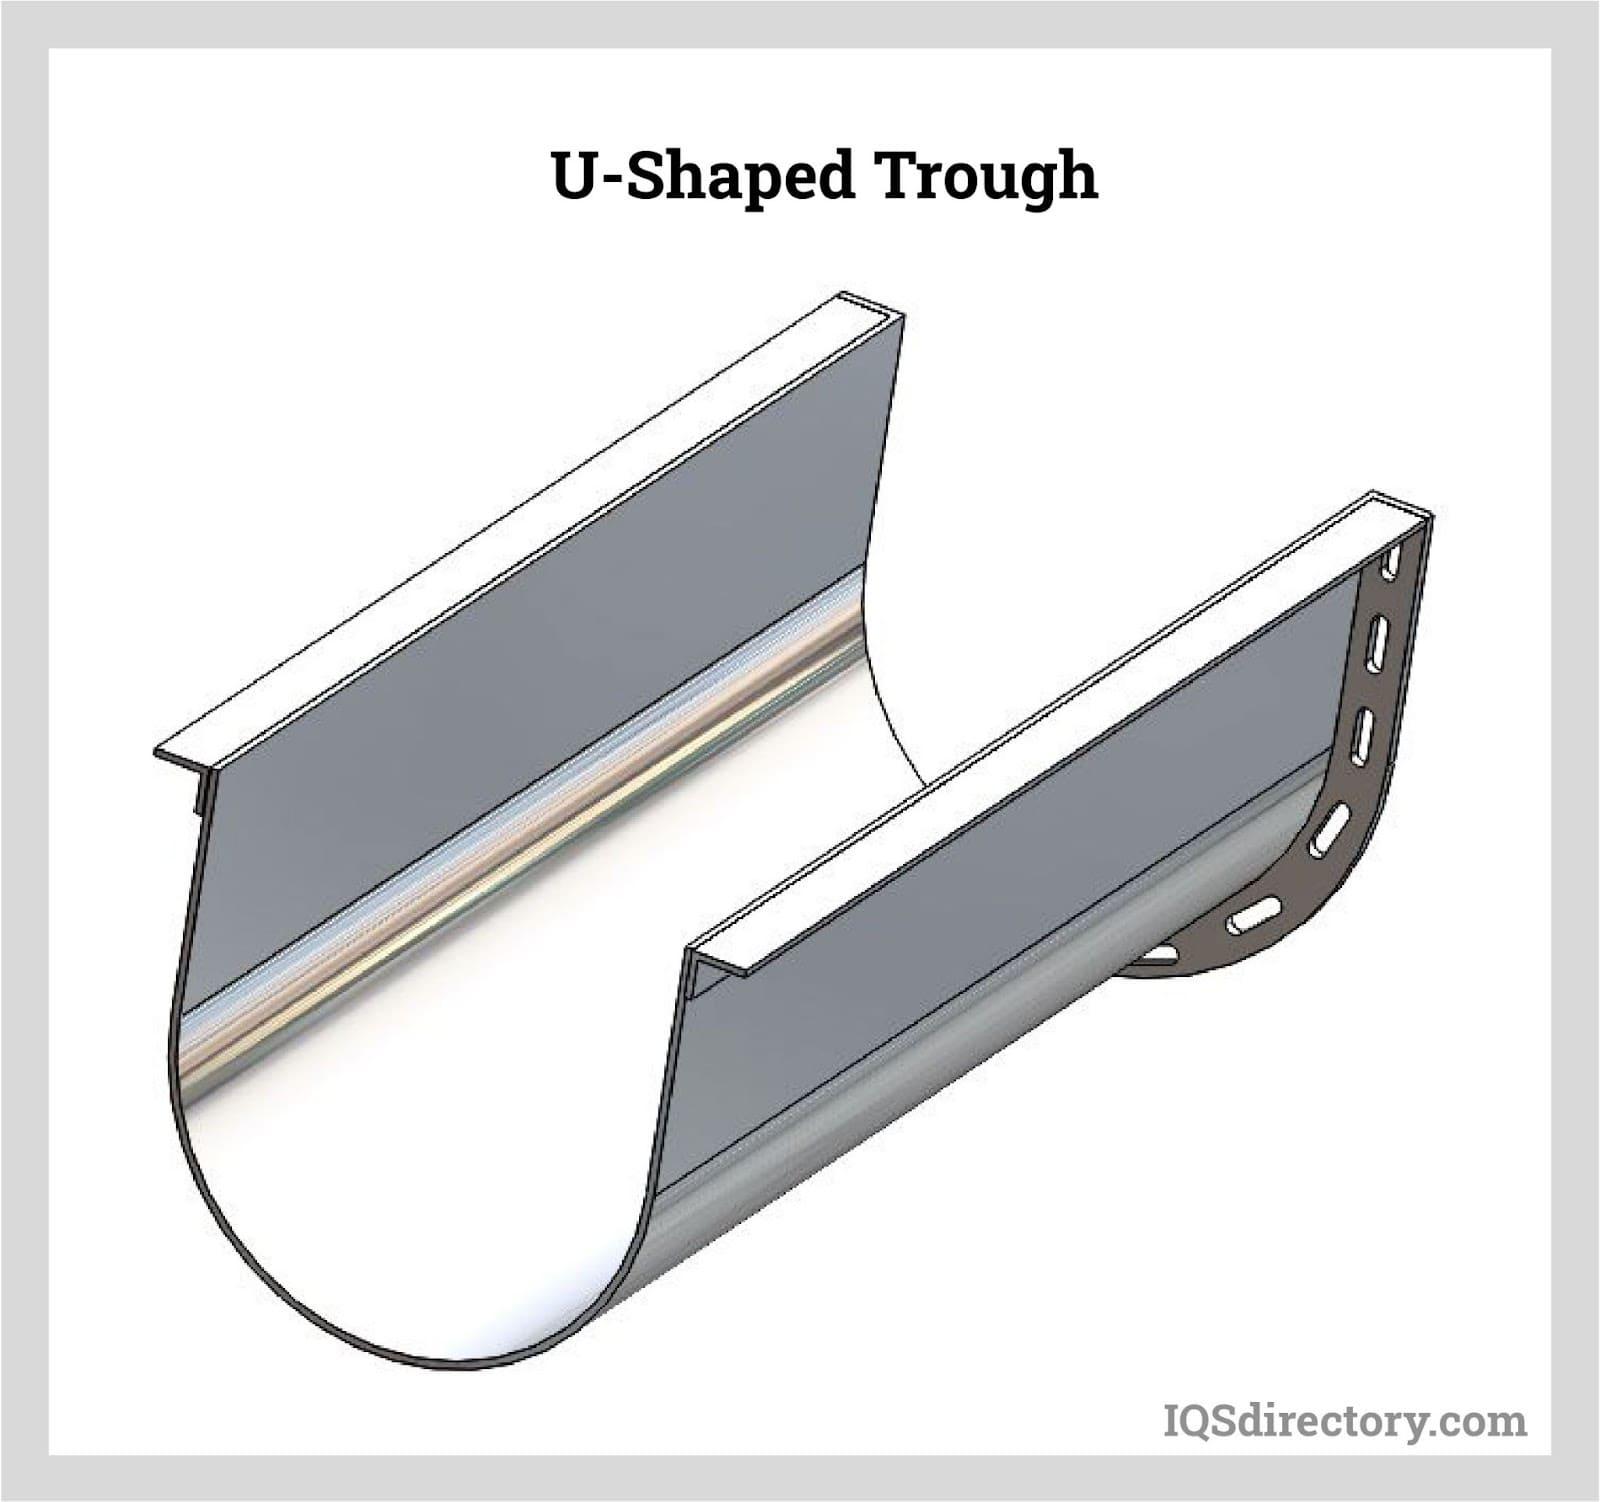 U-Shaped Trough